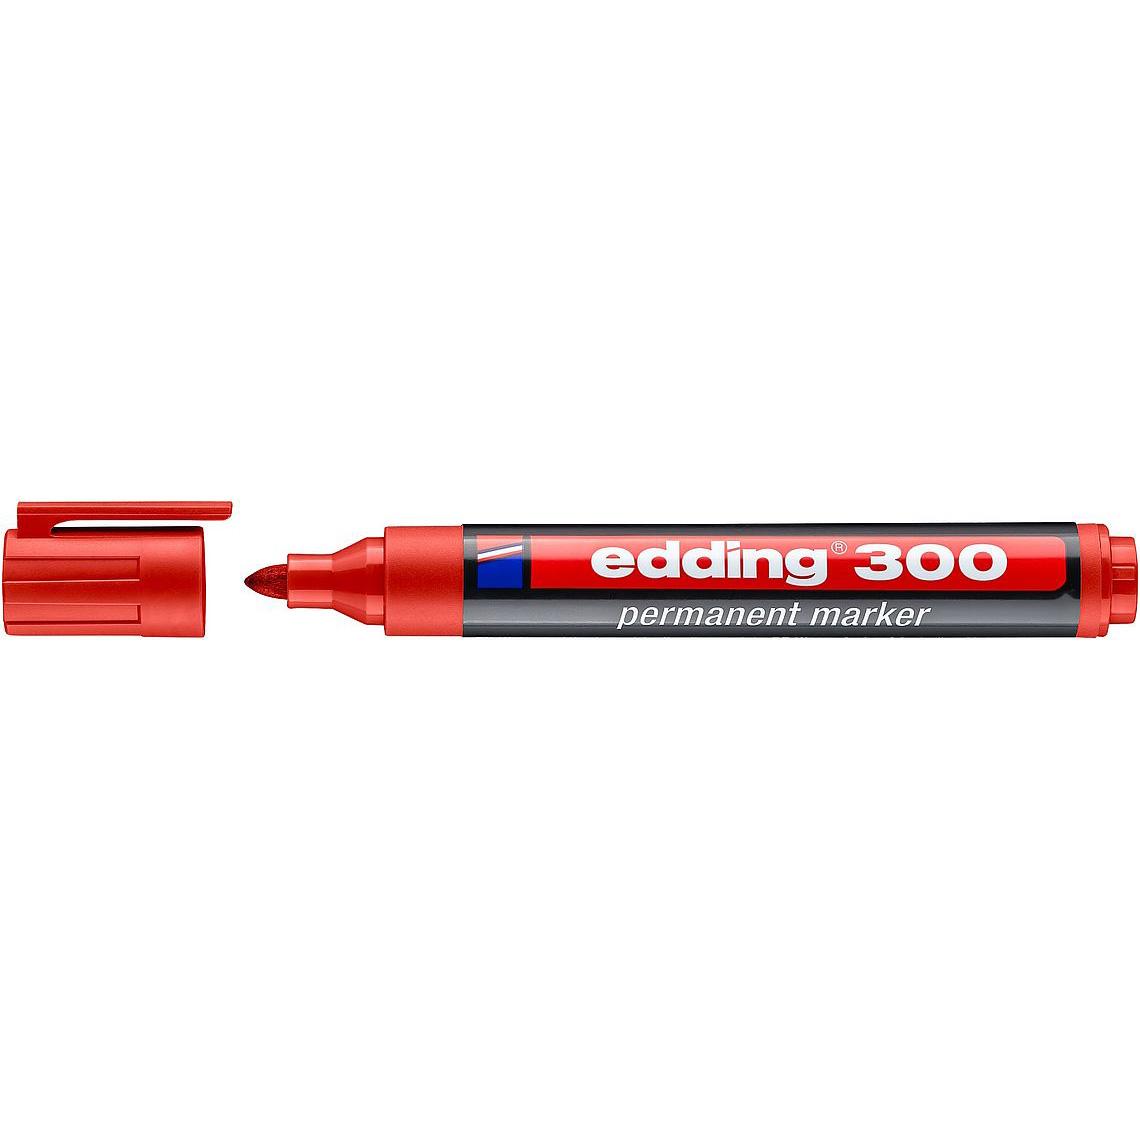 Edding 300 Permanent Marker Bullet Tip - Red (pc)